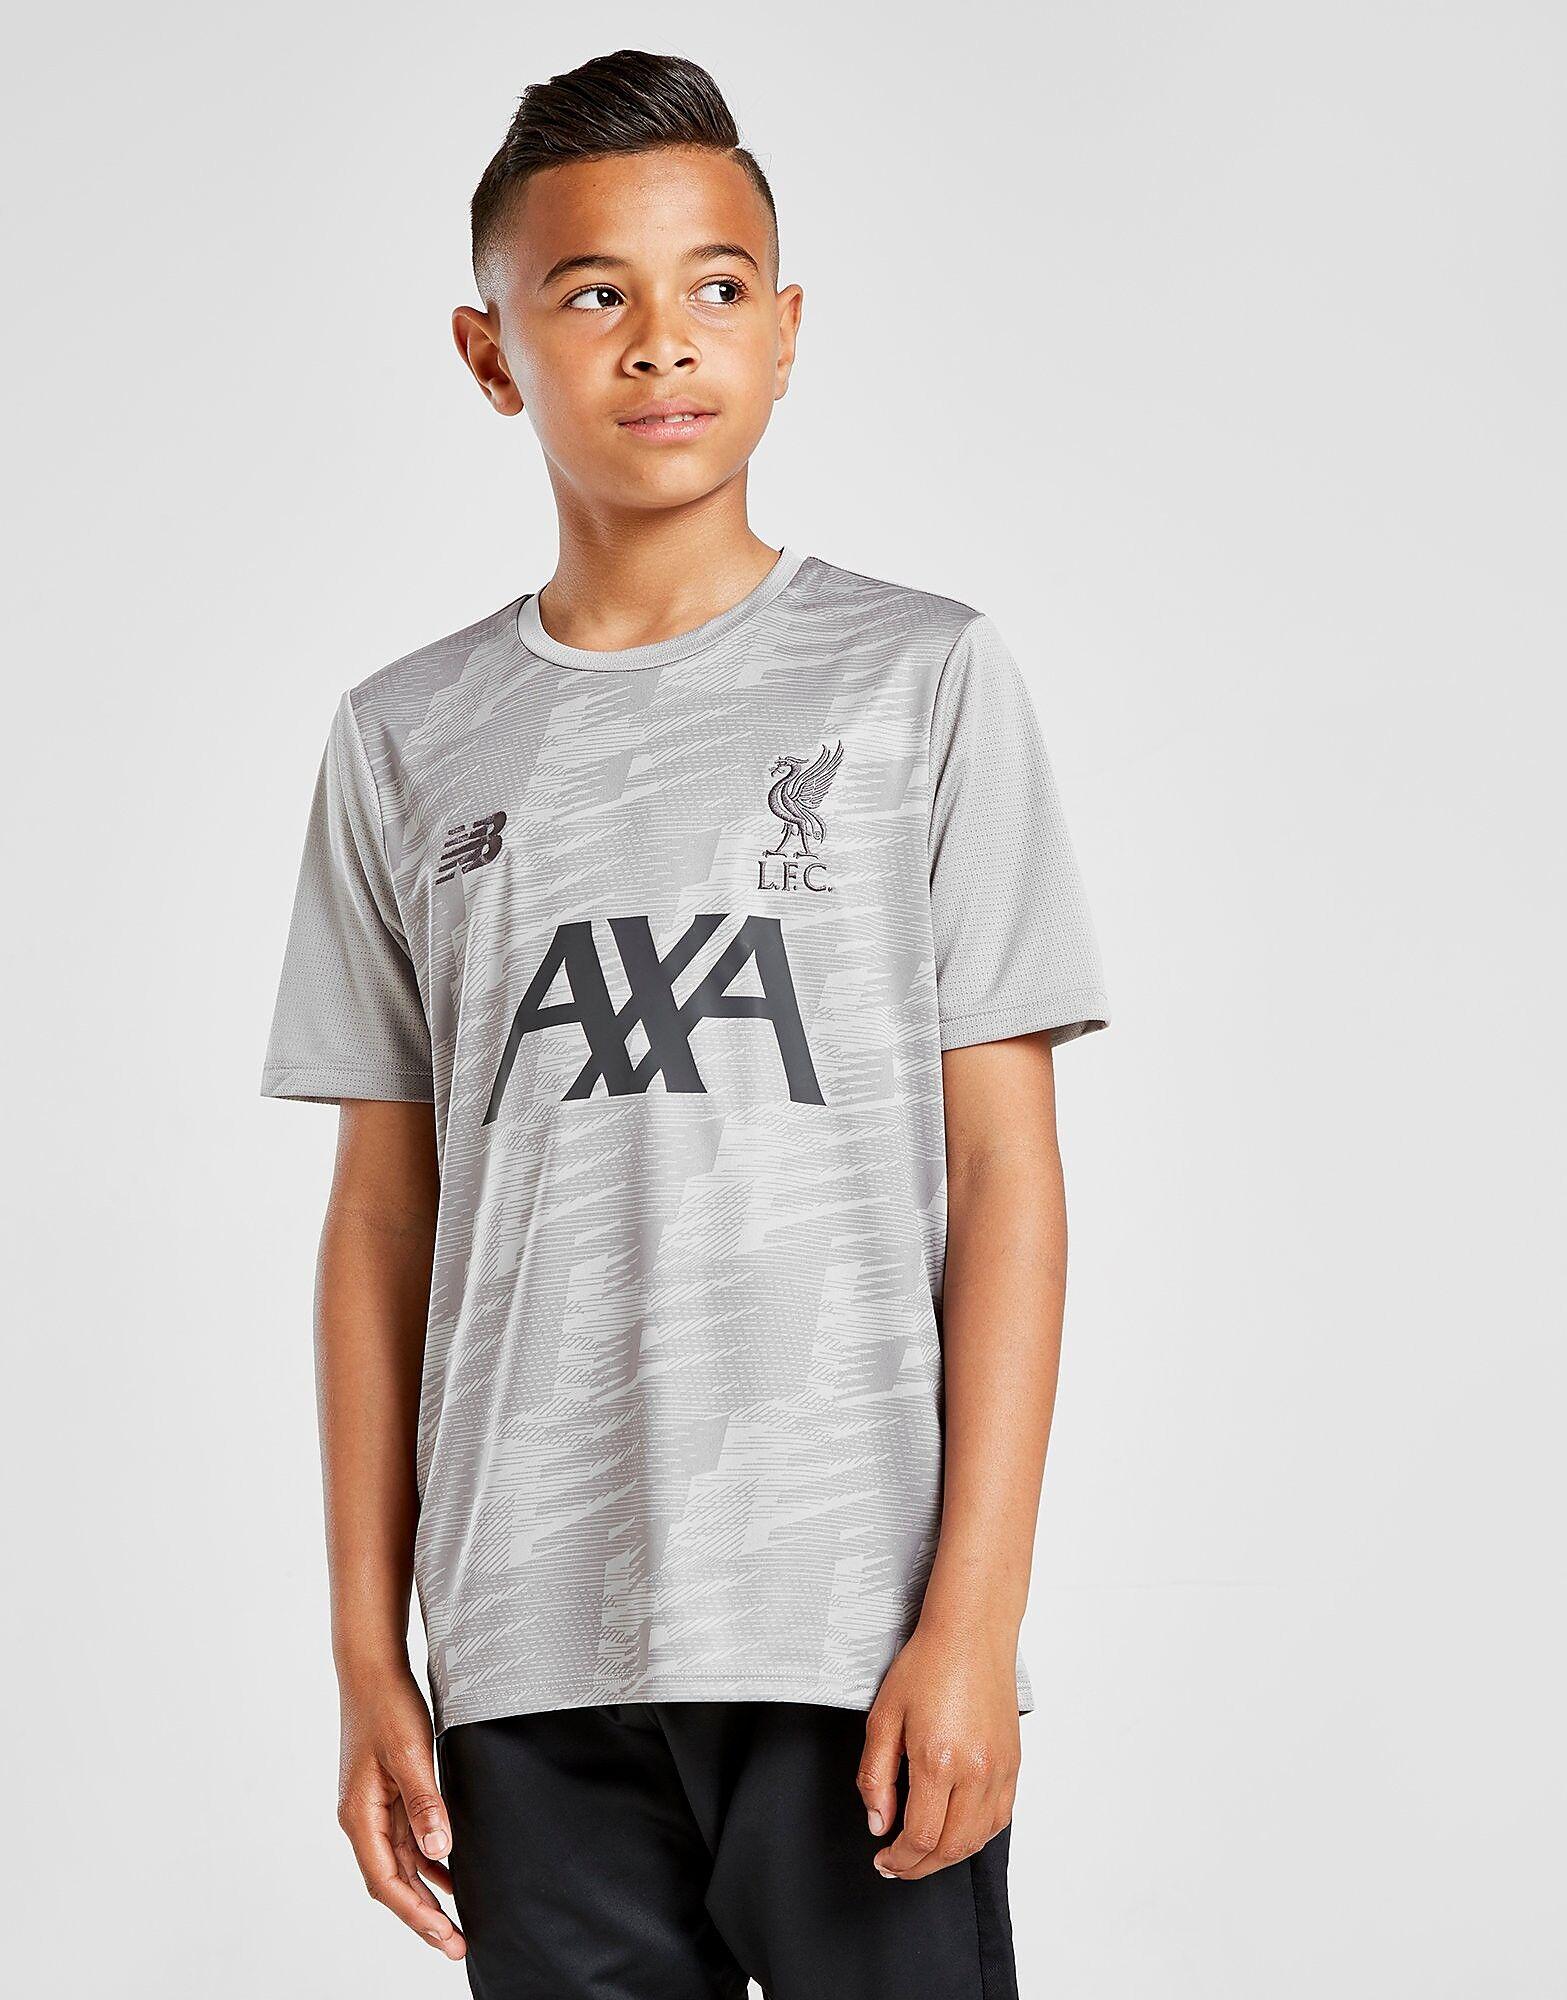 Image of New Balance Liverpool FC kevyt treenipaita Juniorit - Kids, Harmaa